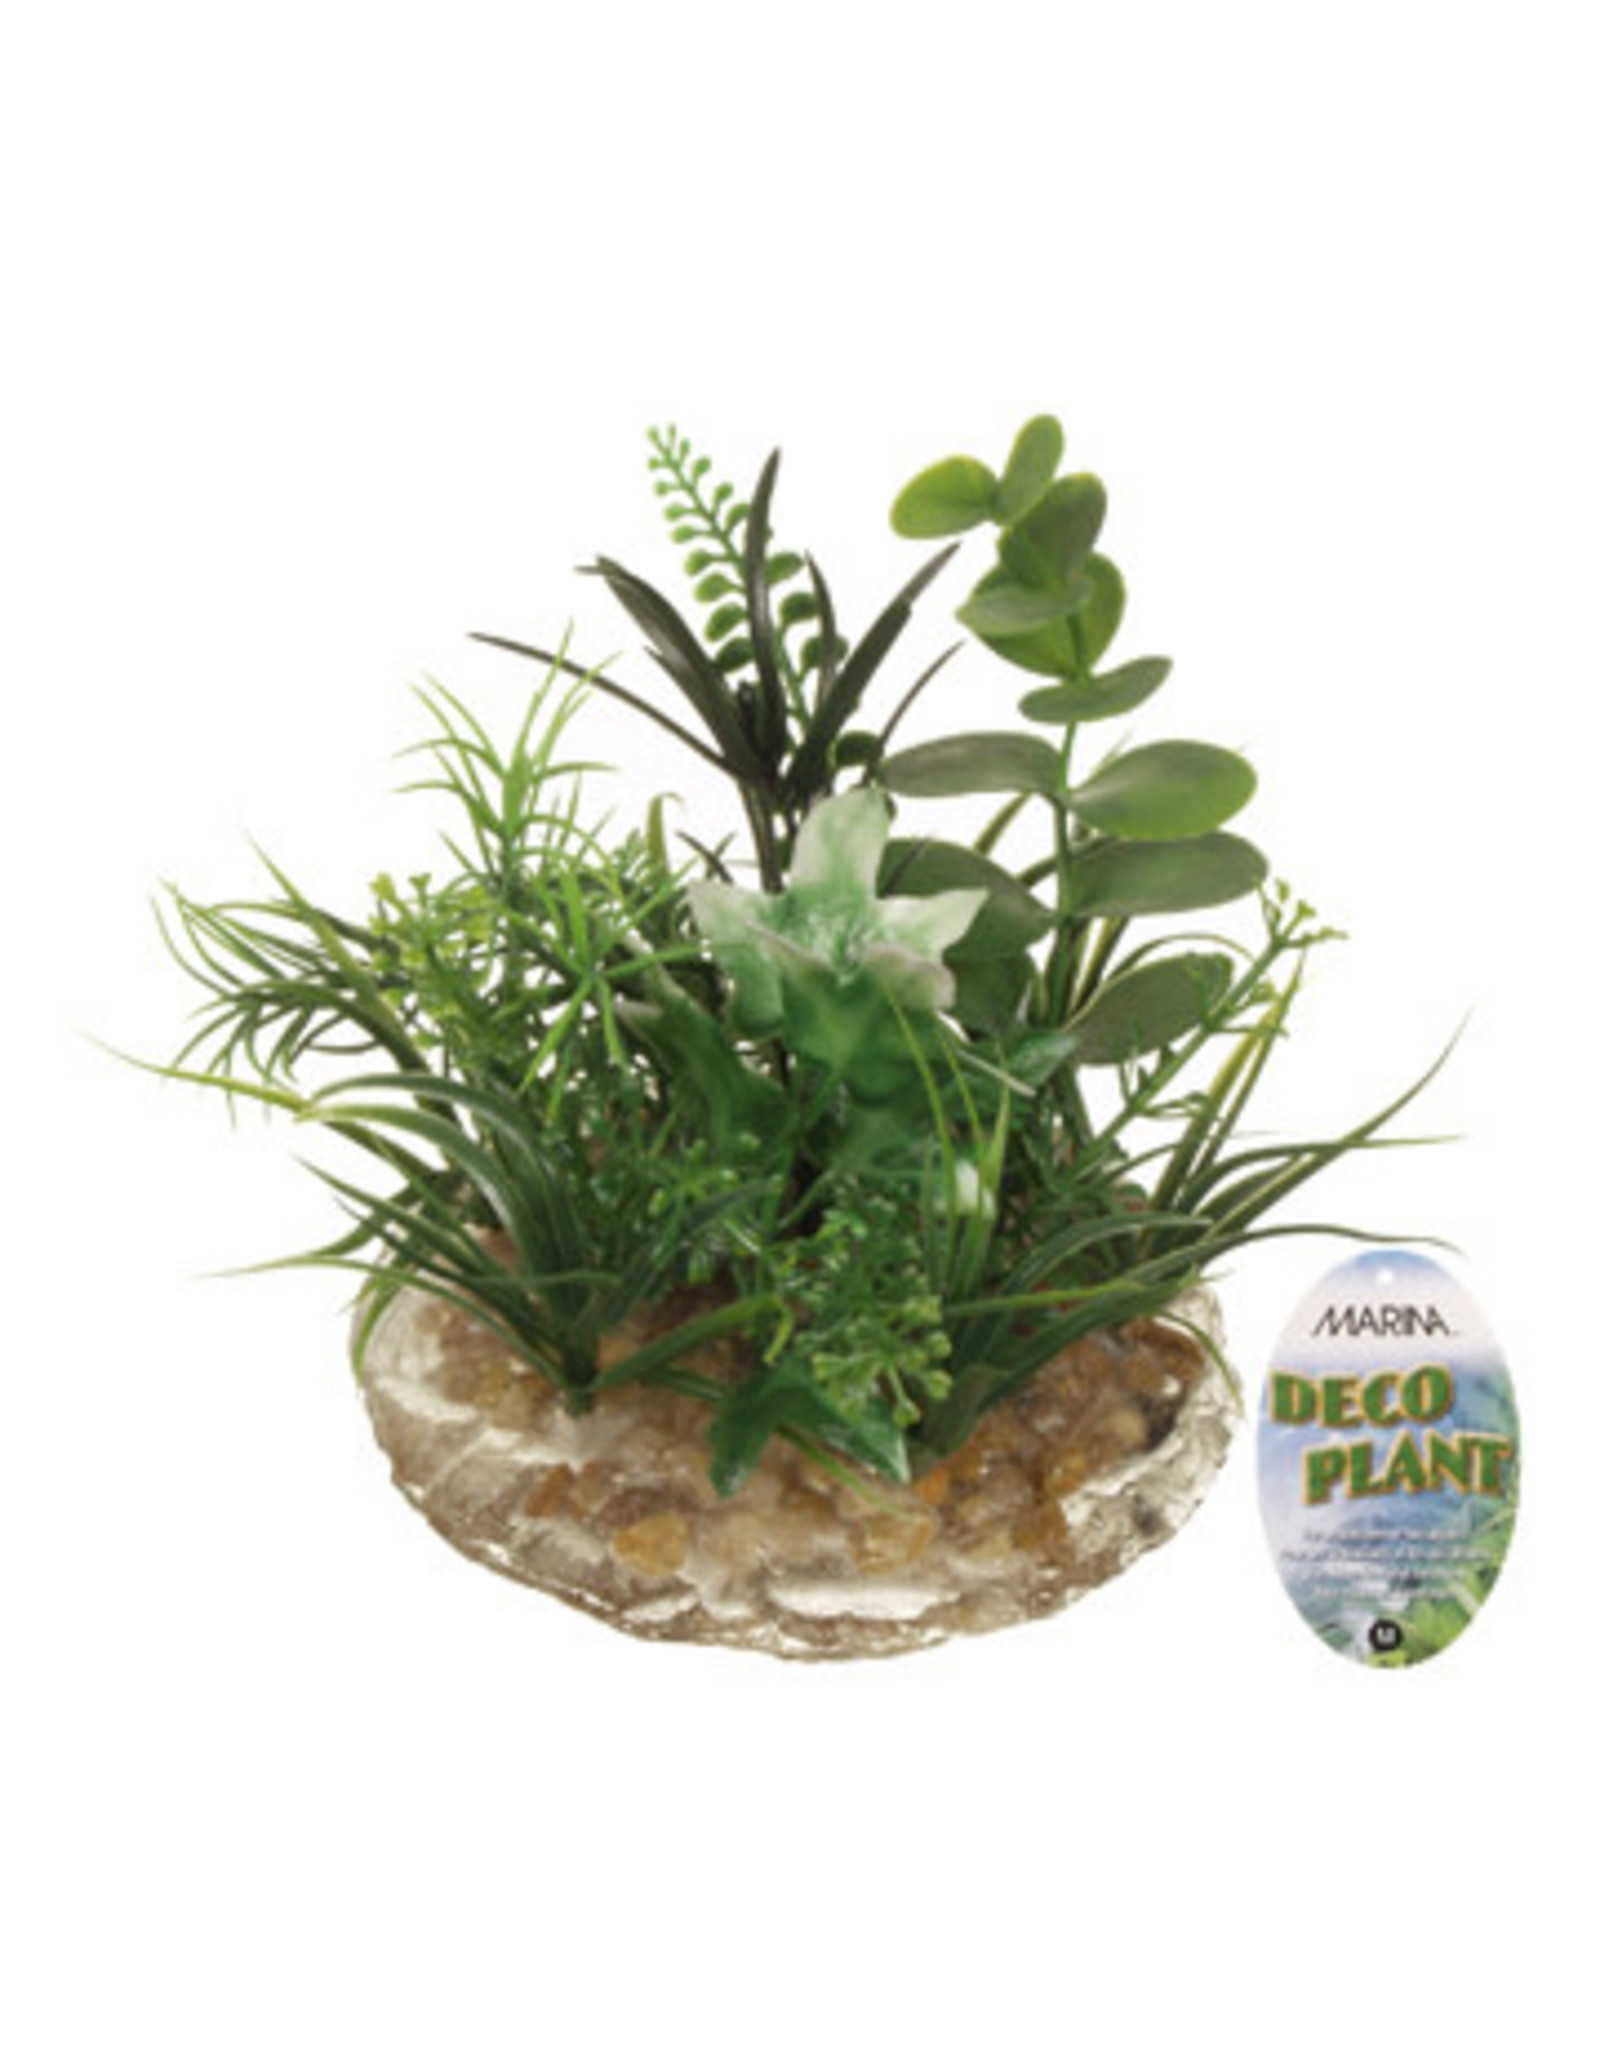 Marina Marina Deco Plant Ornament - Medium - 8.9 cm (3.5 in)